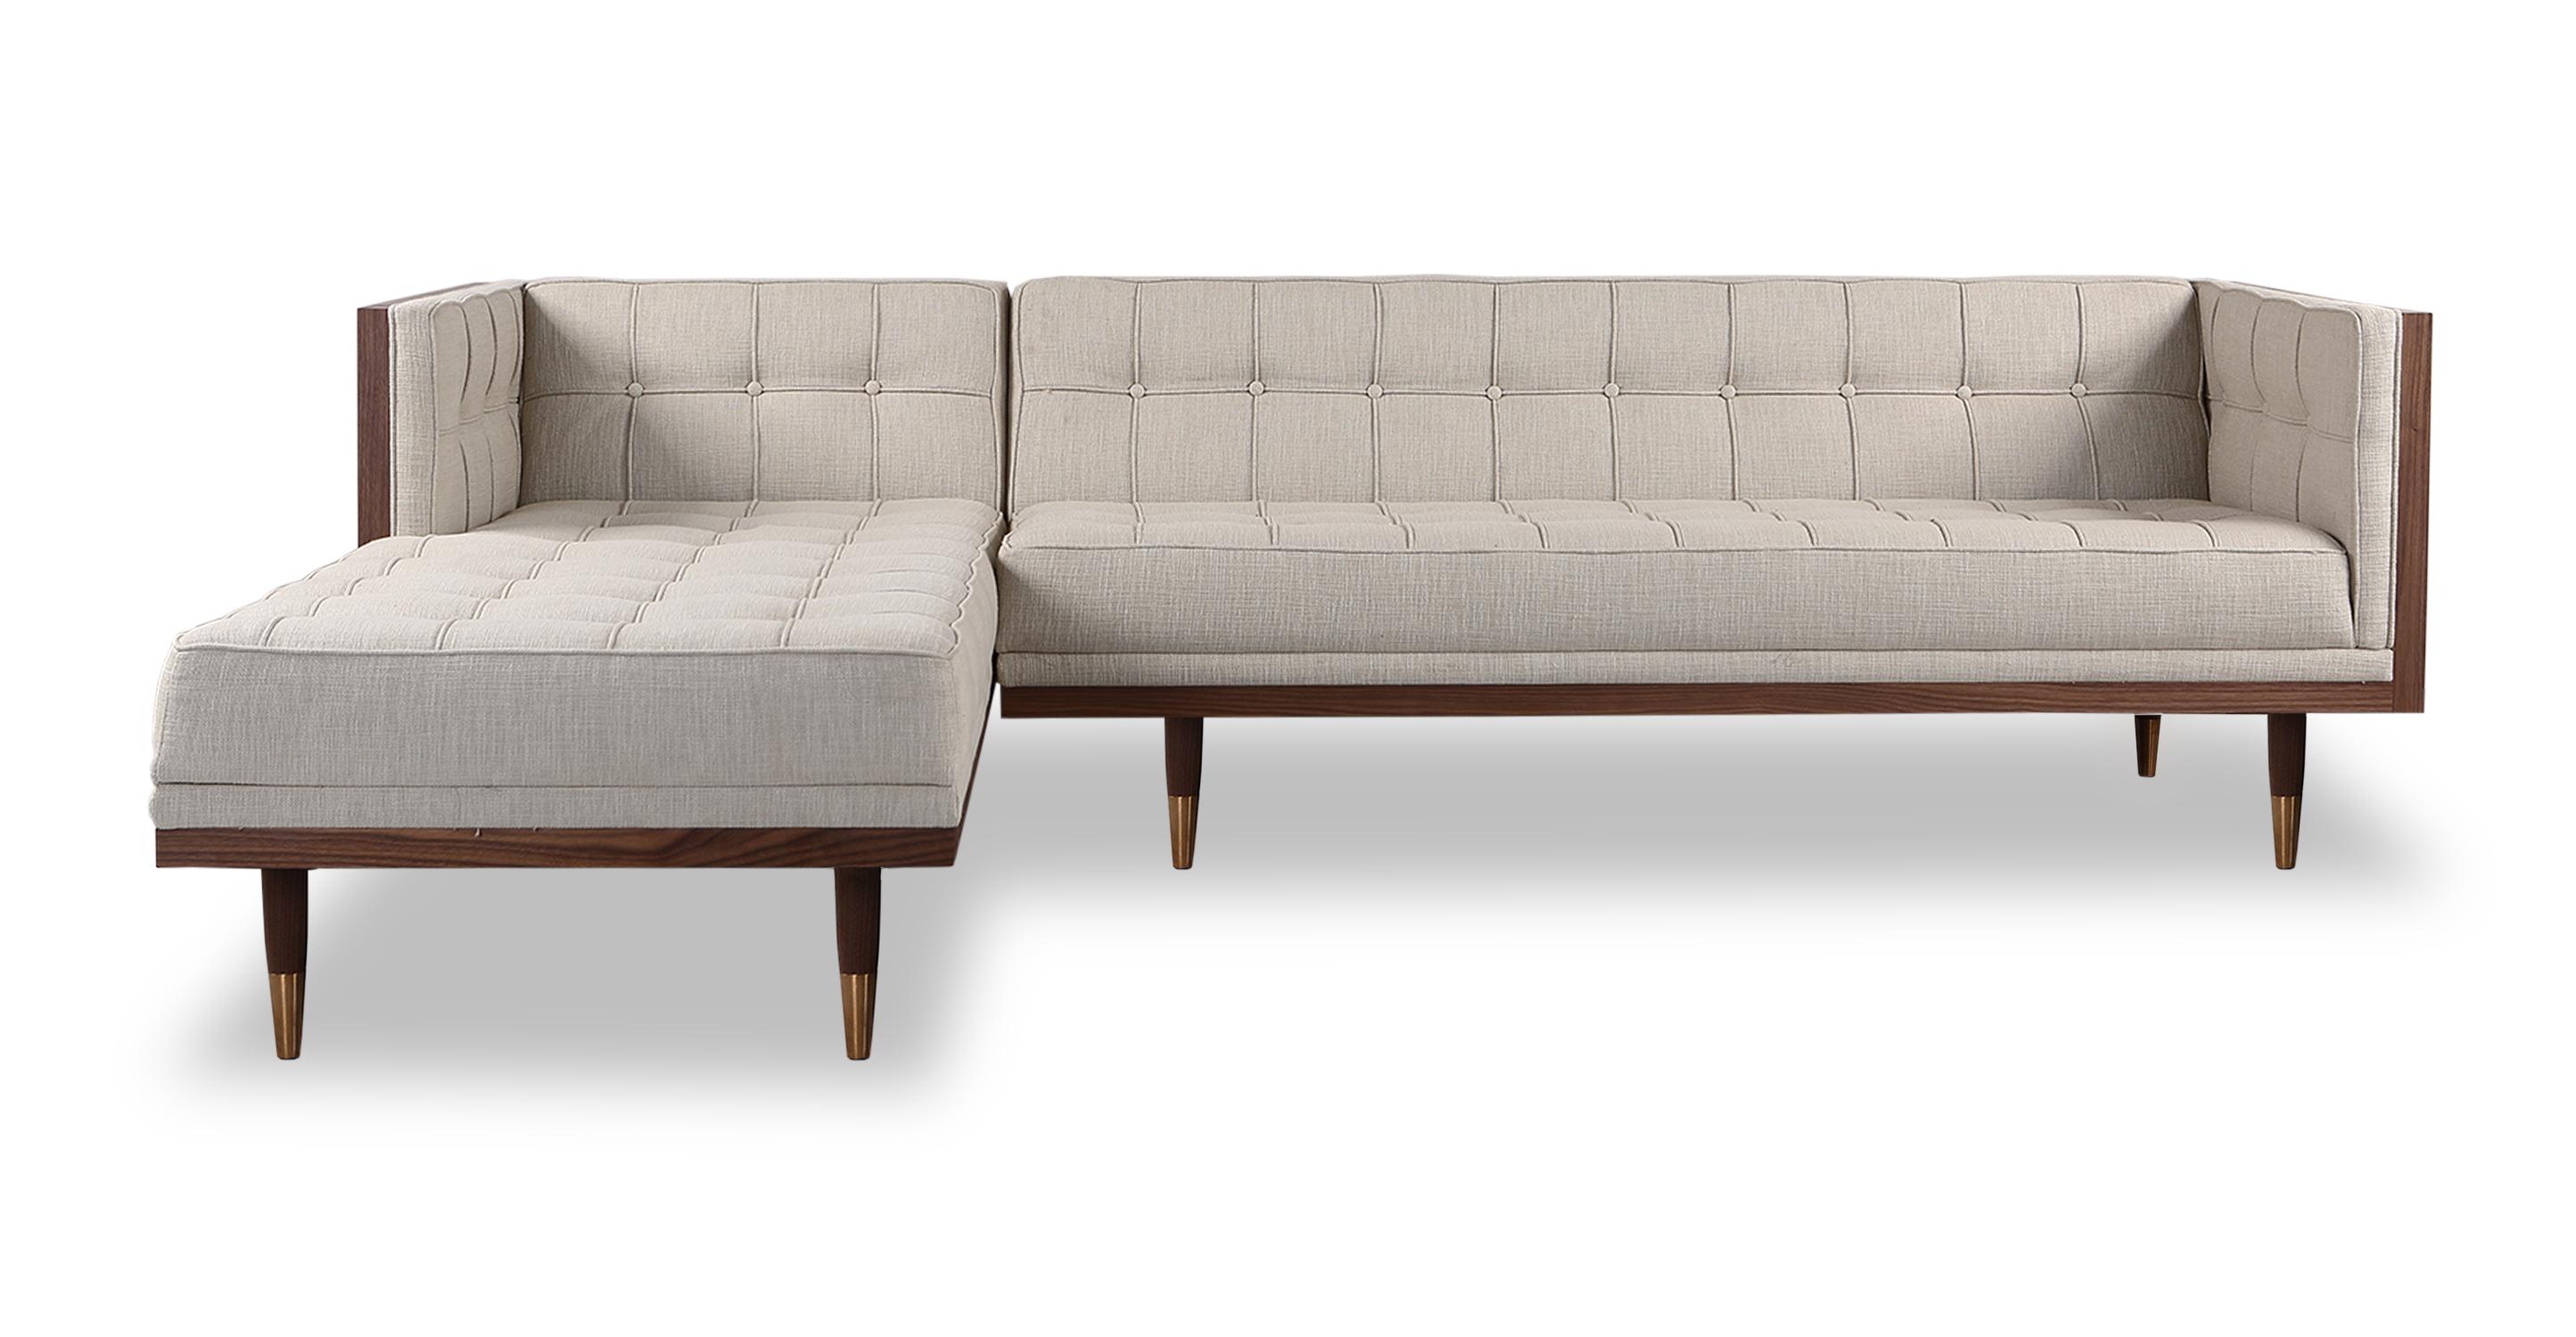 "Woodrow Box 100"" Fabric Sofa Sectional Left, Walnut/Urban Hemp"